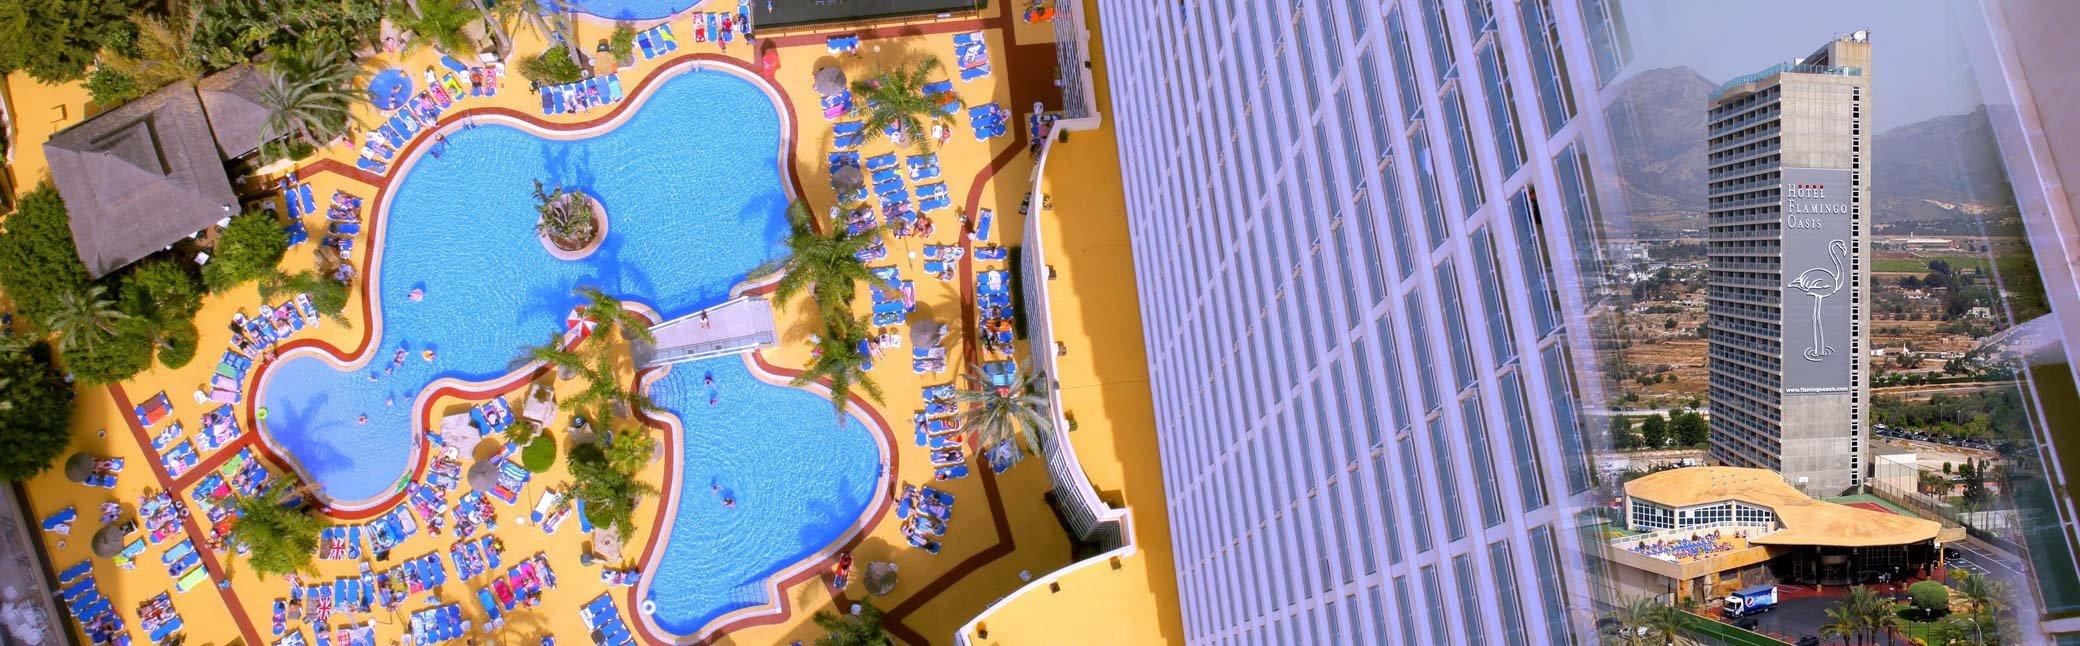 Medplaya Hotels Official Site Hotels In Salou